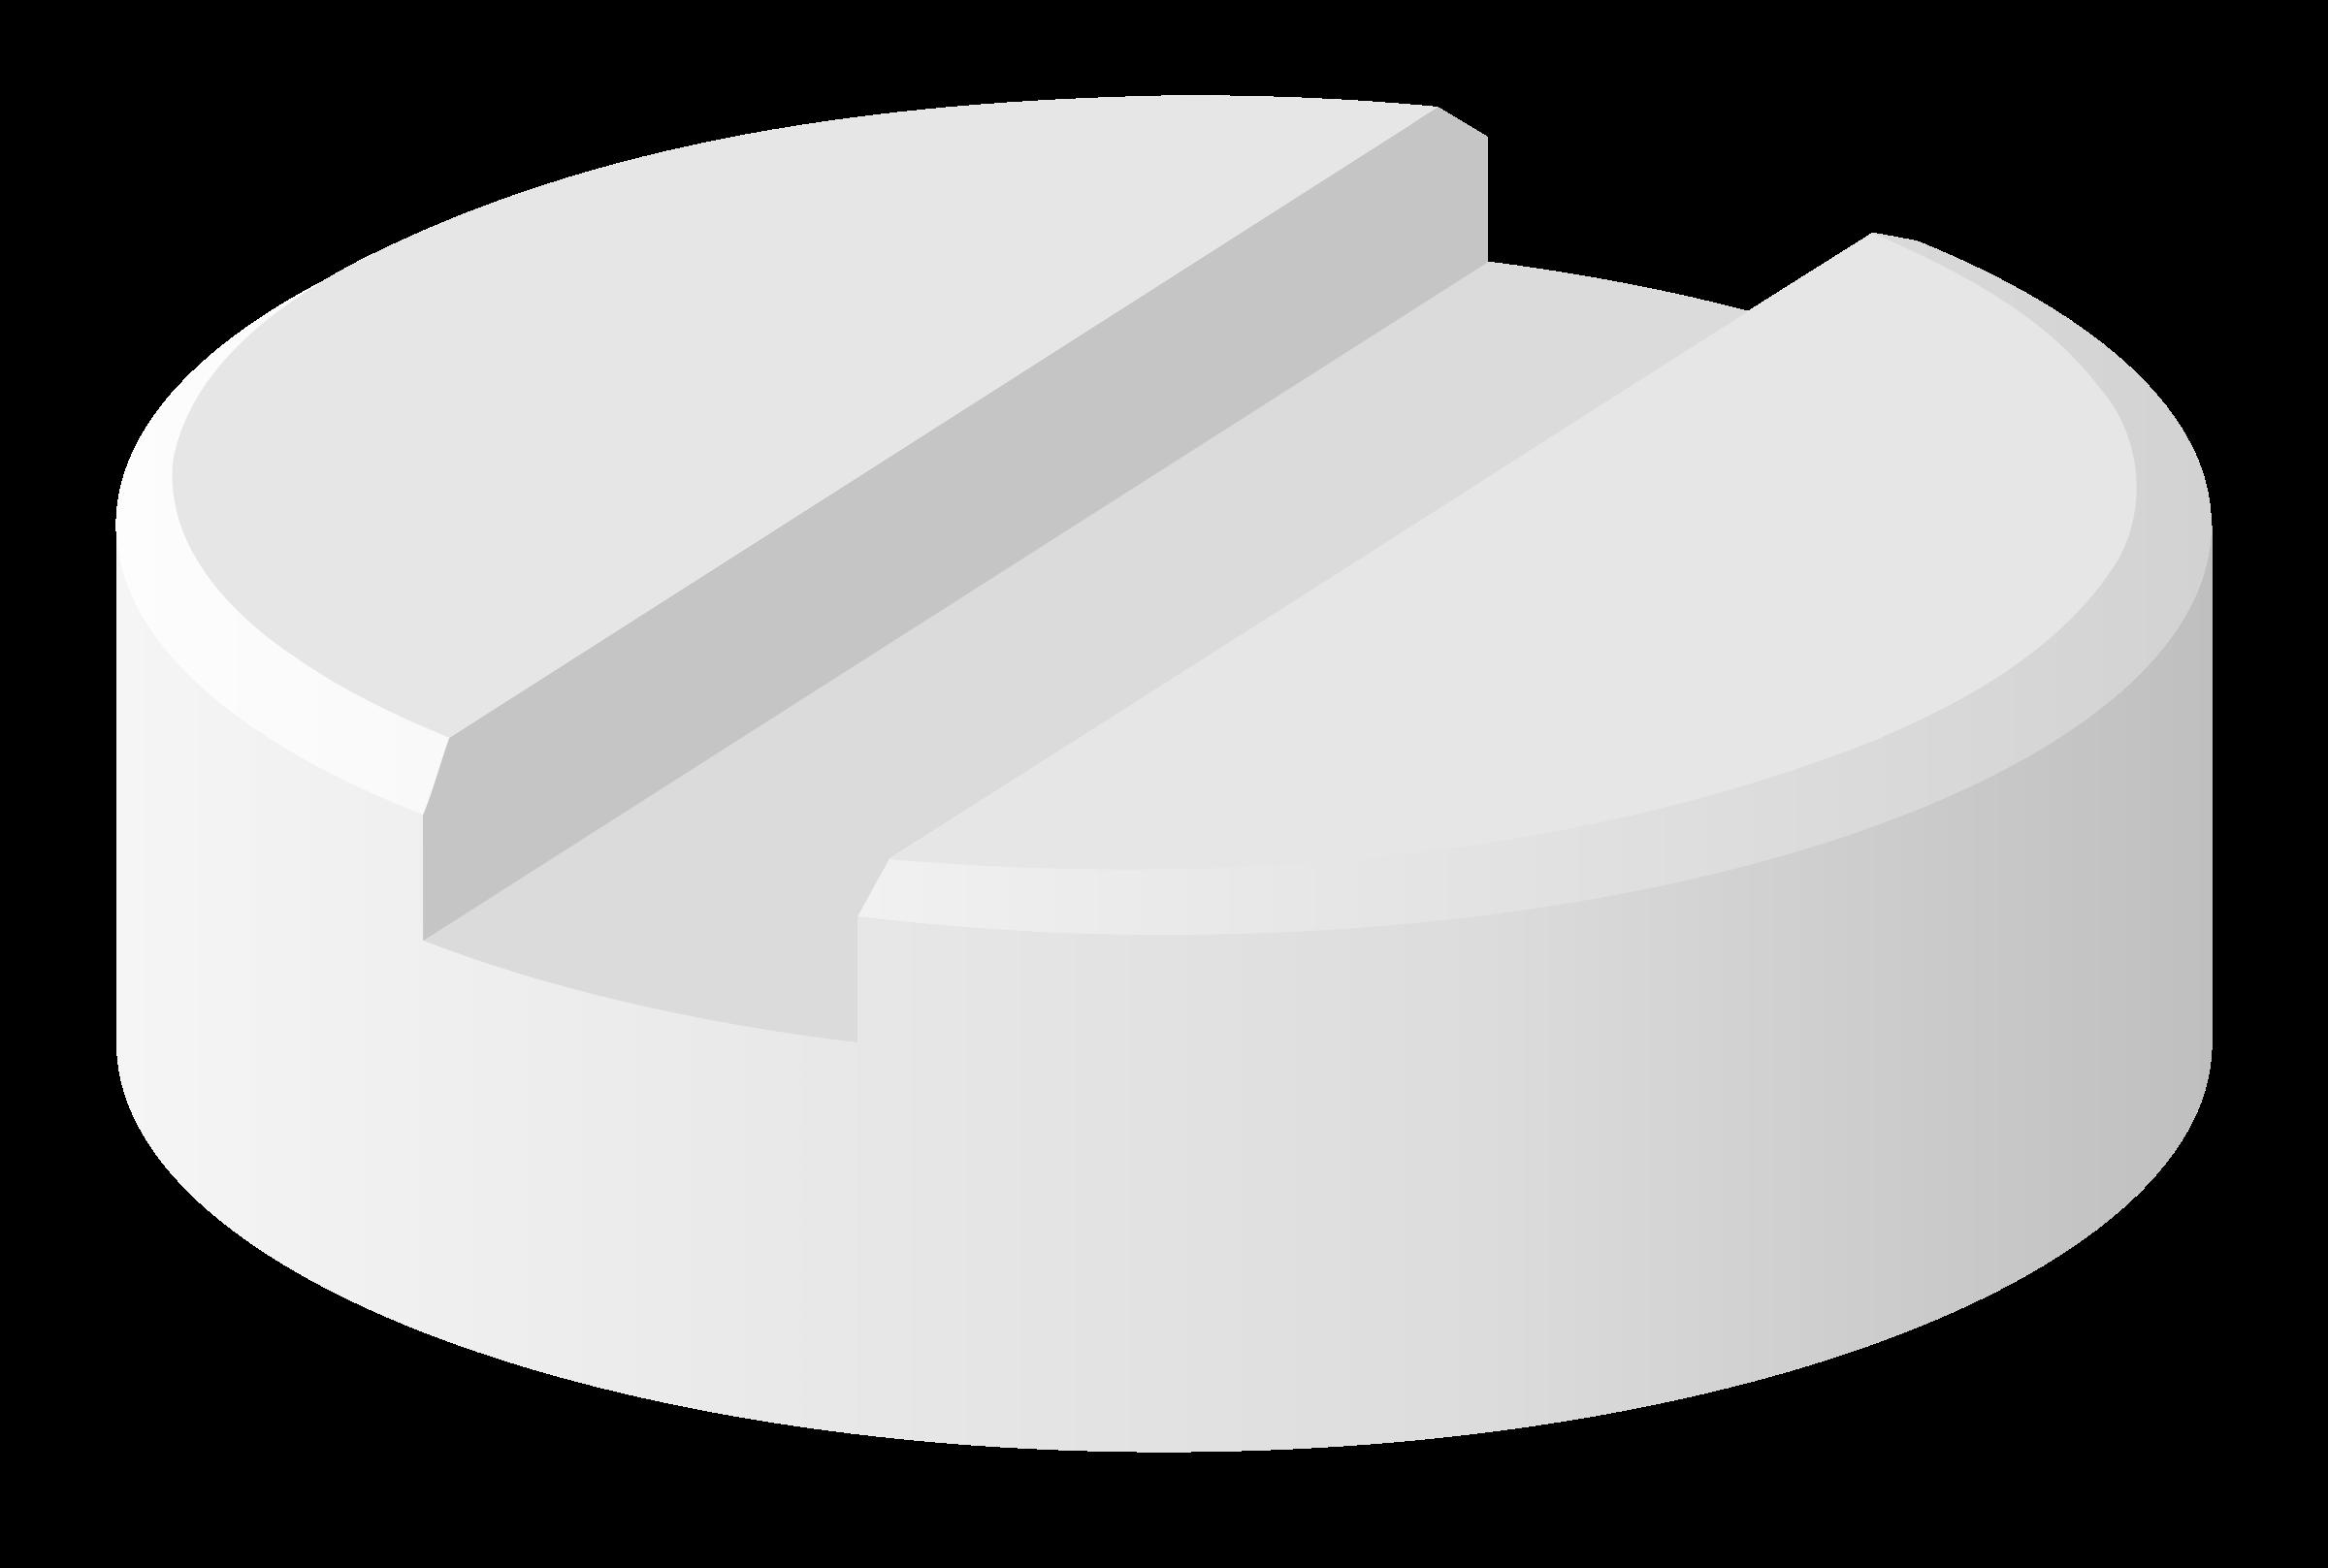 Pills circle